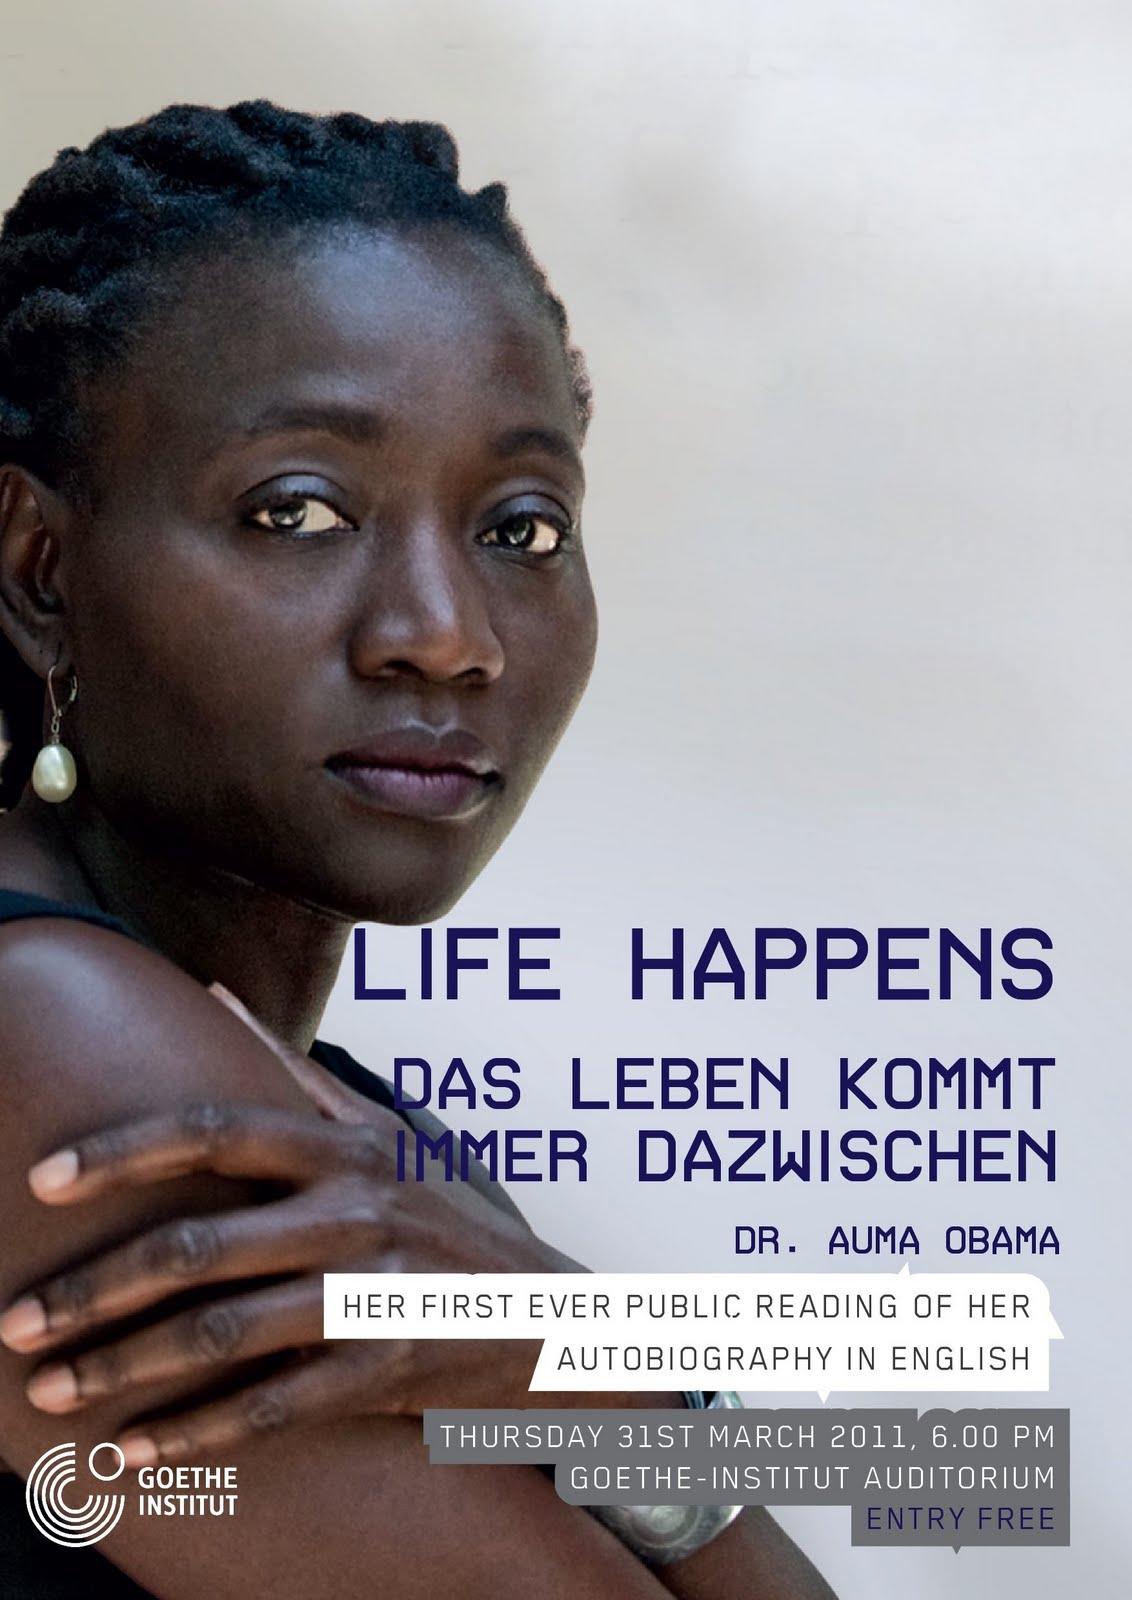 Hot Secrets: OBAMA'S SISTER HOST BOOK READING IN NAIROBI